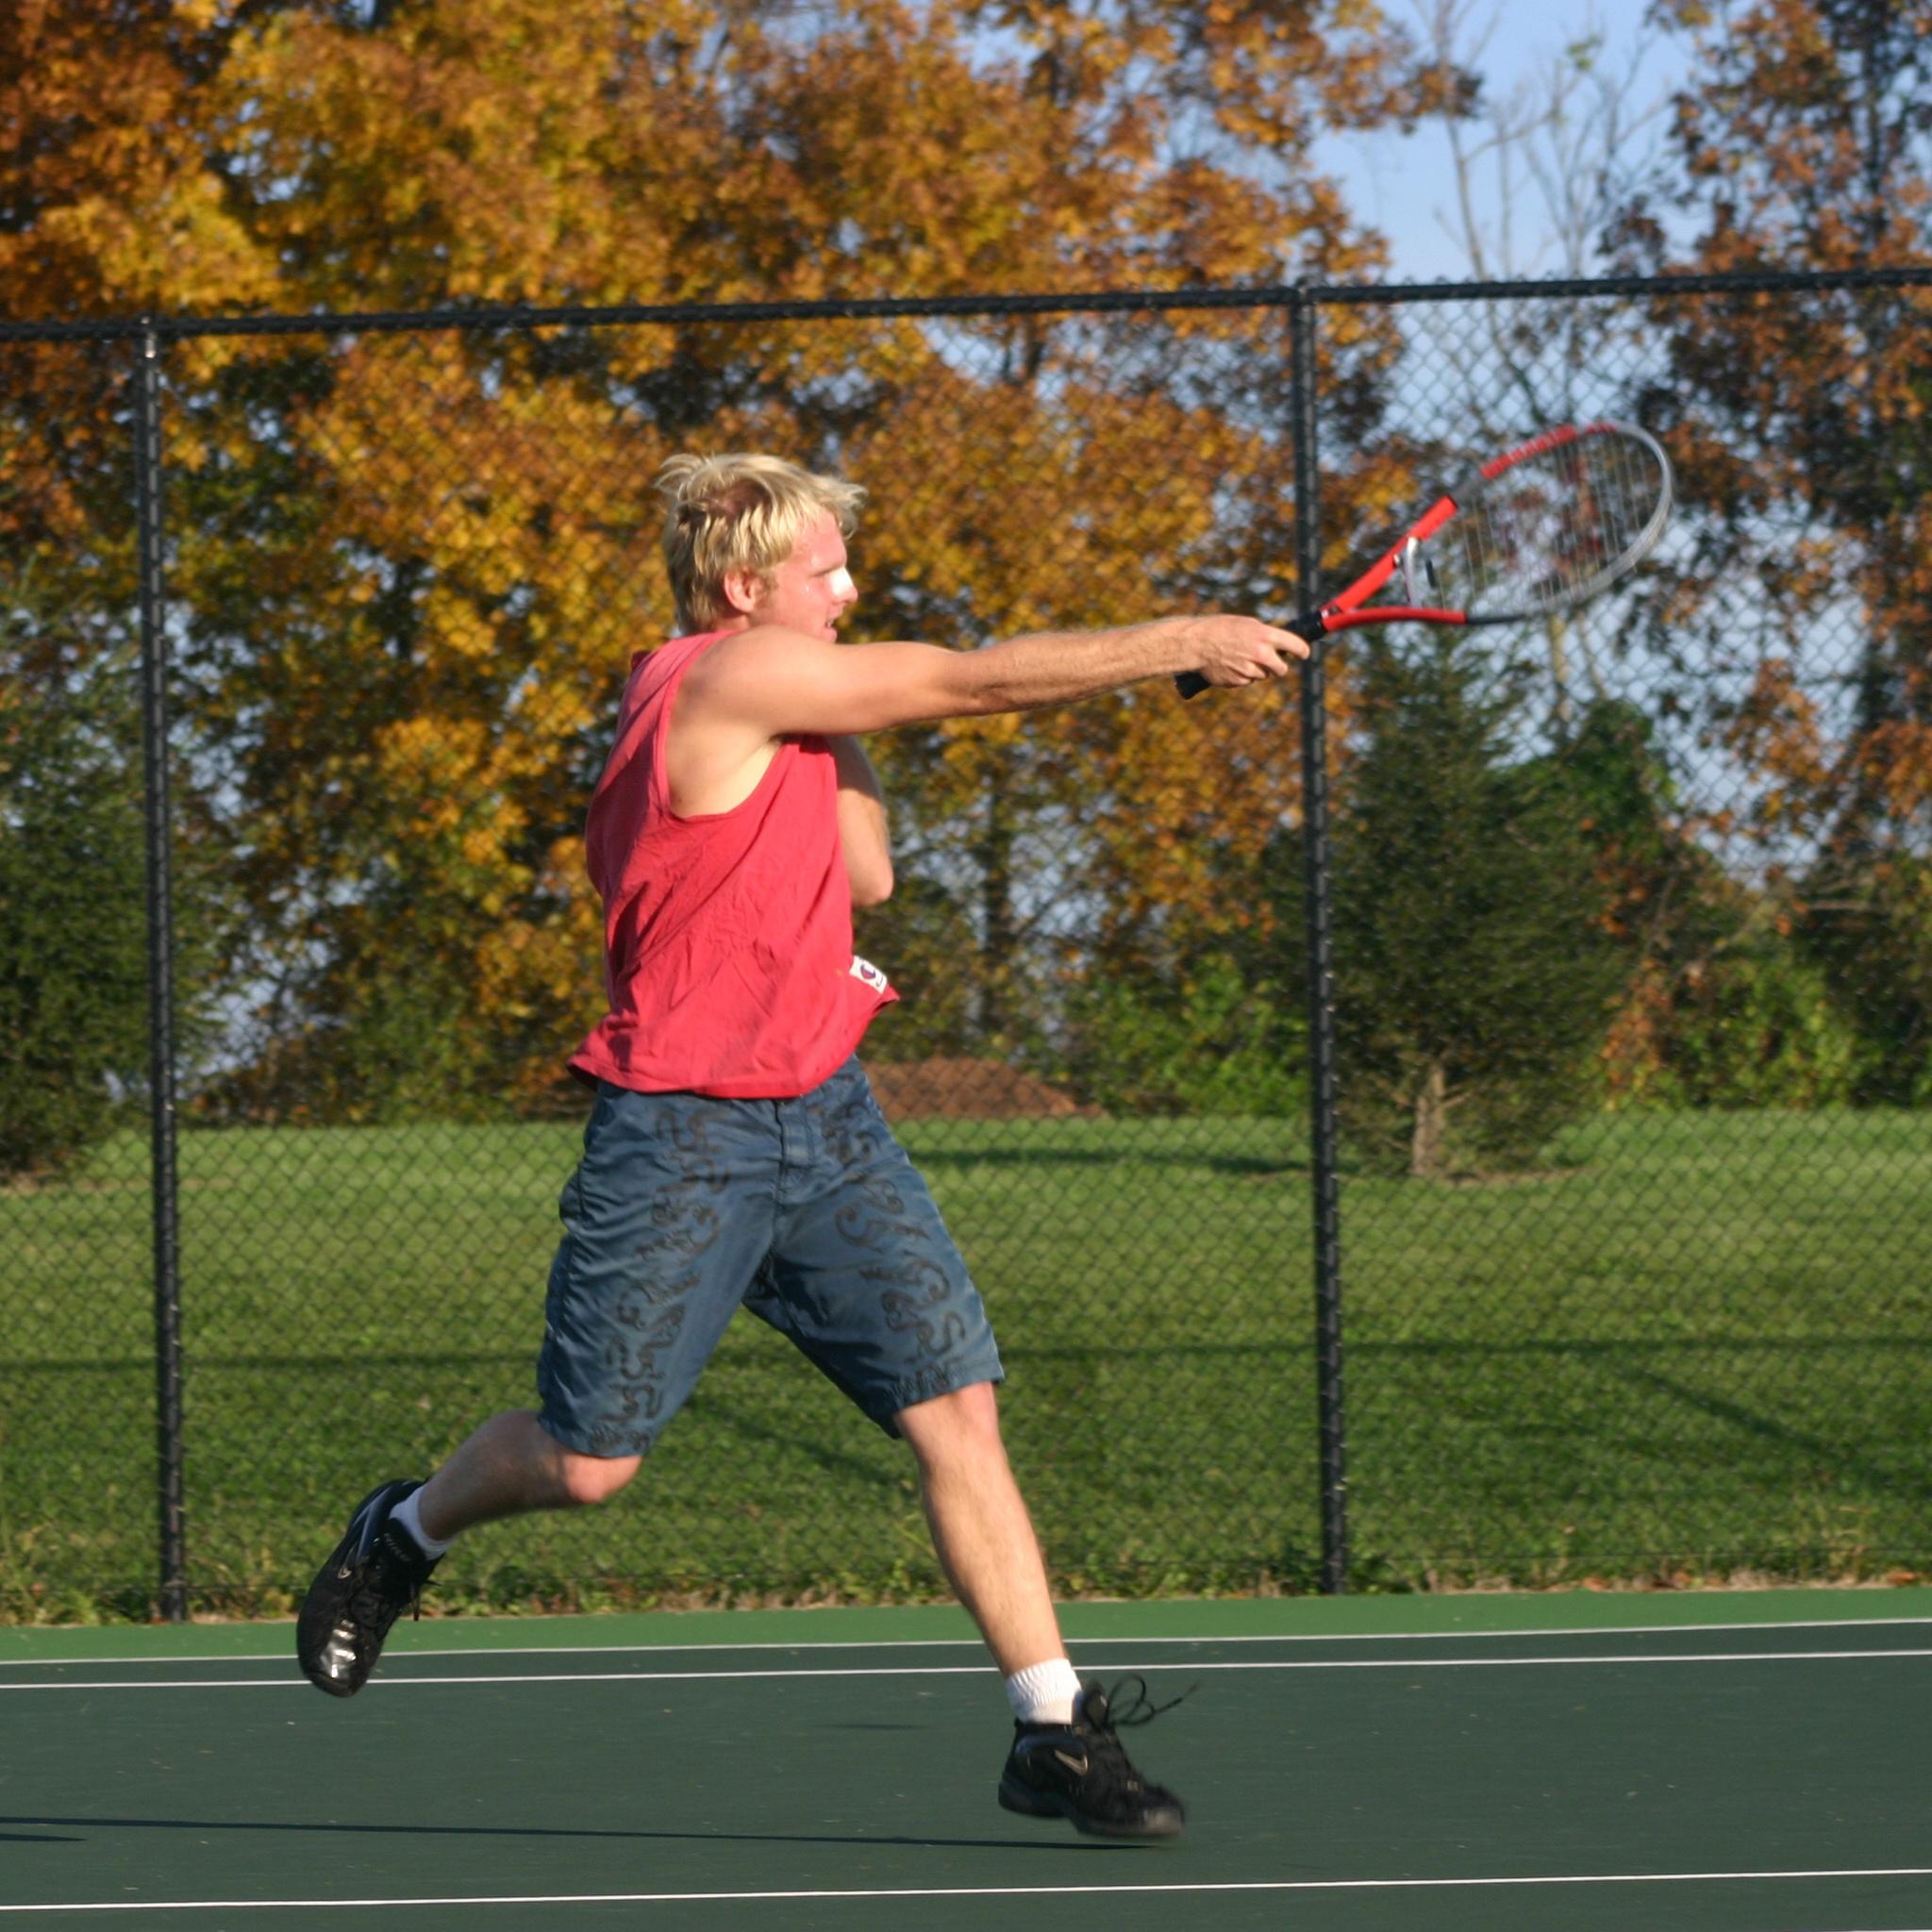 Tennis Patrick Henry College (PHC)